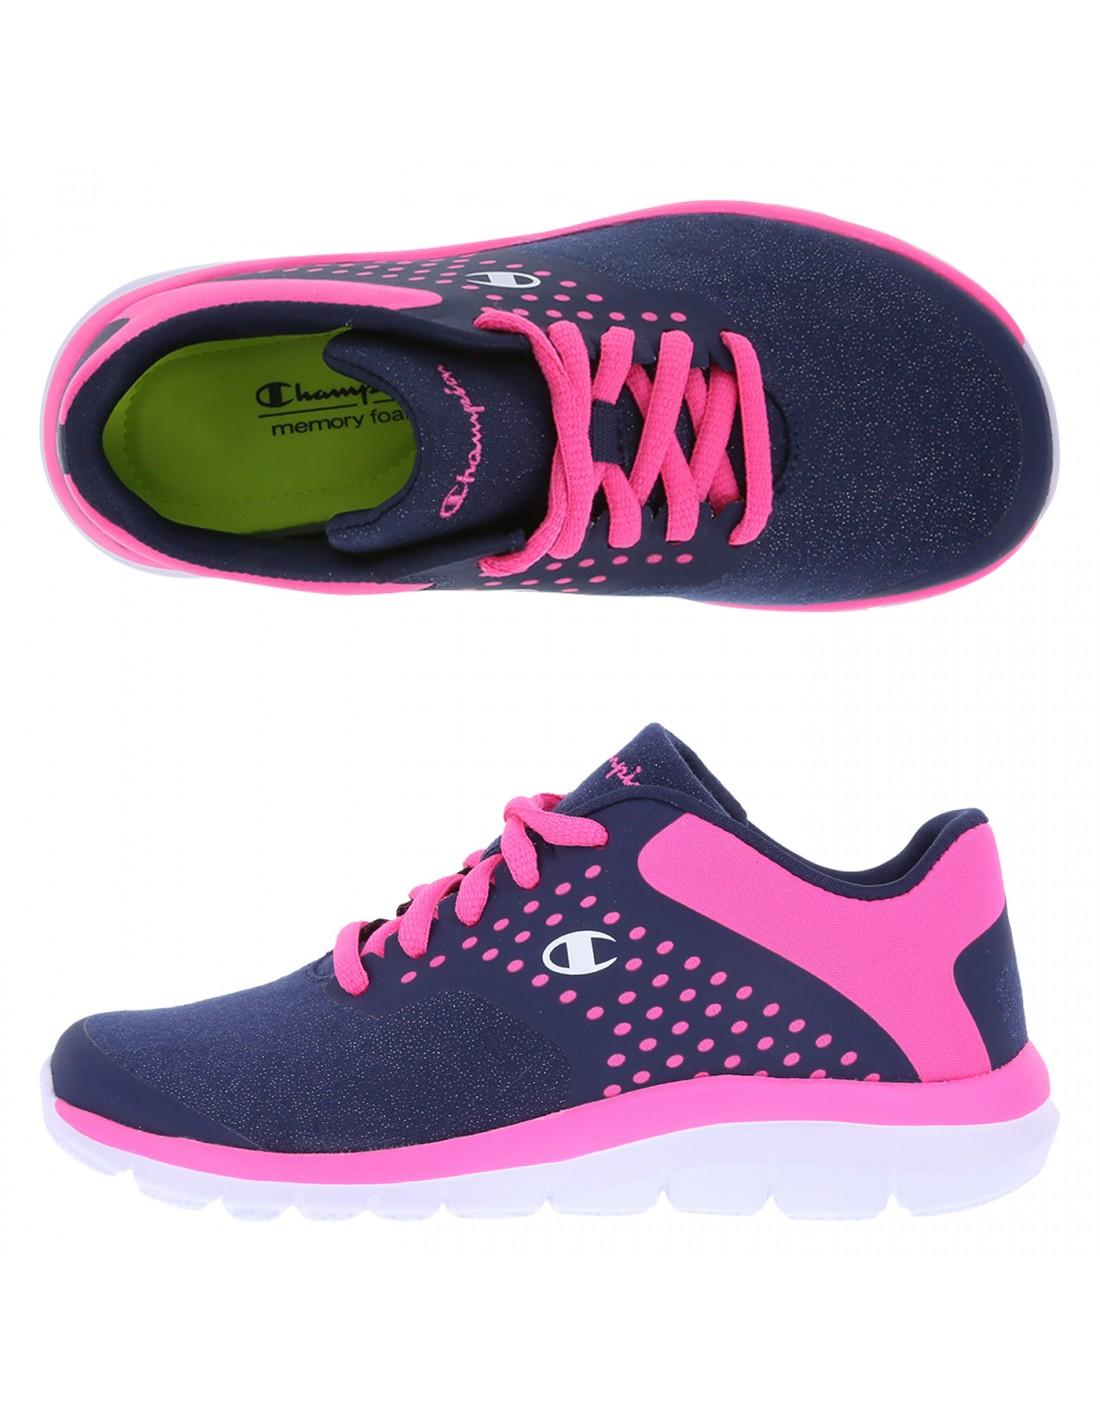 9b8c5b9f96f0a Champion Gusto Girls Running Shoe